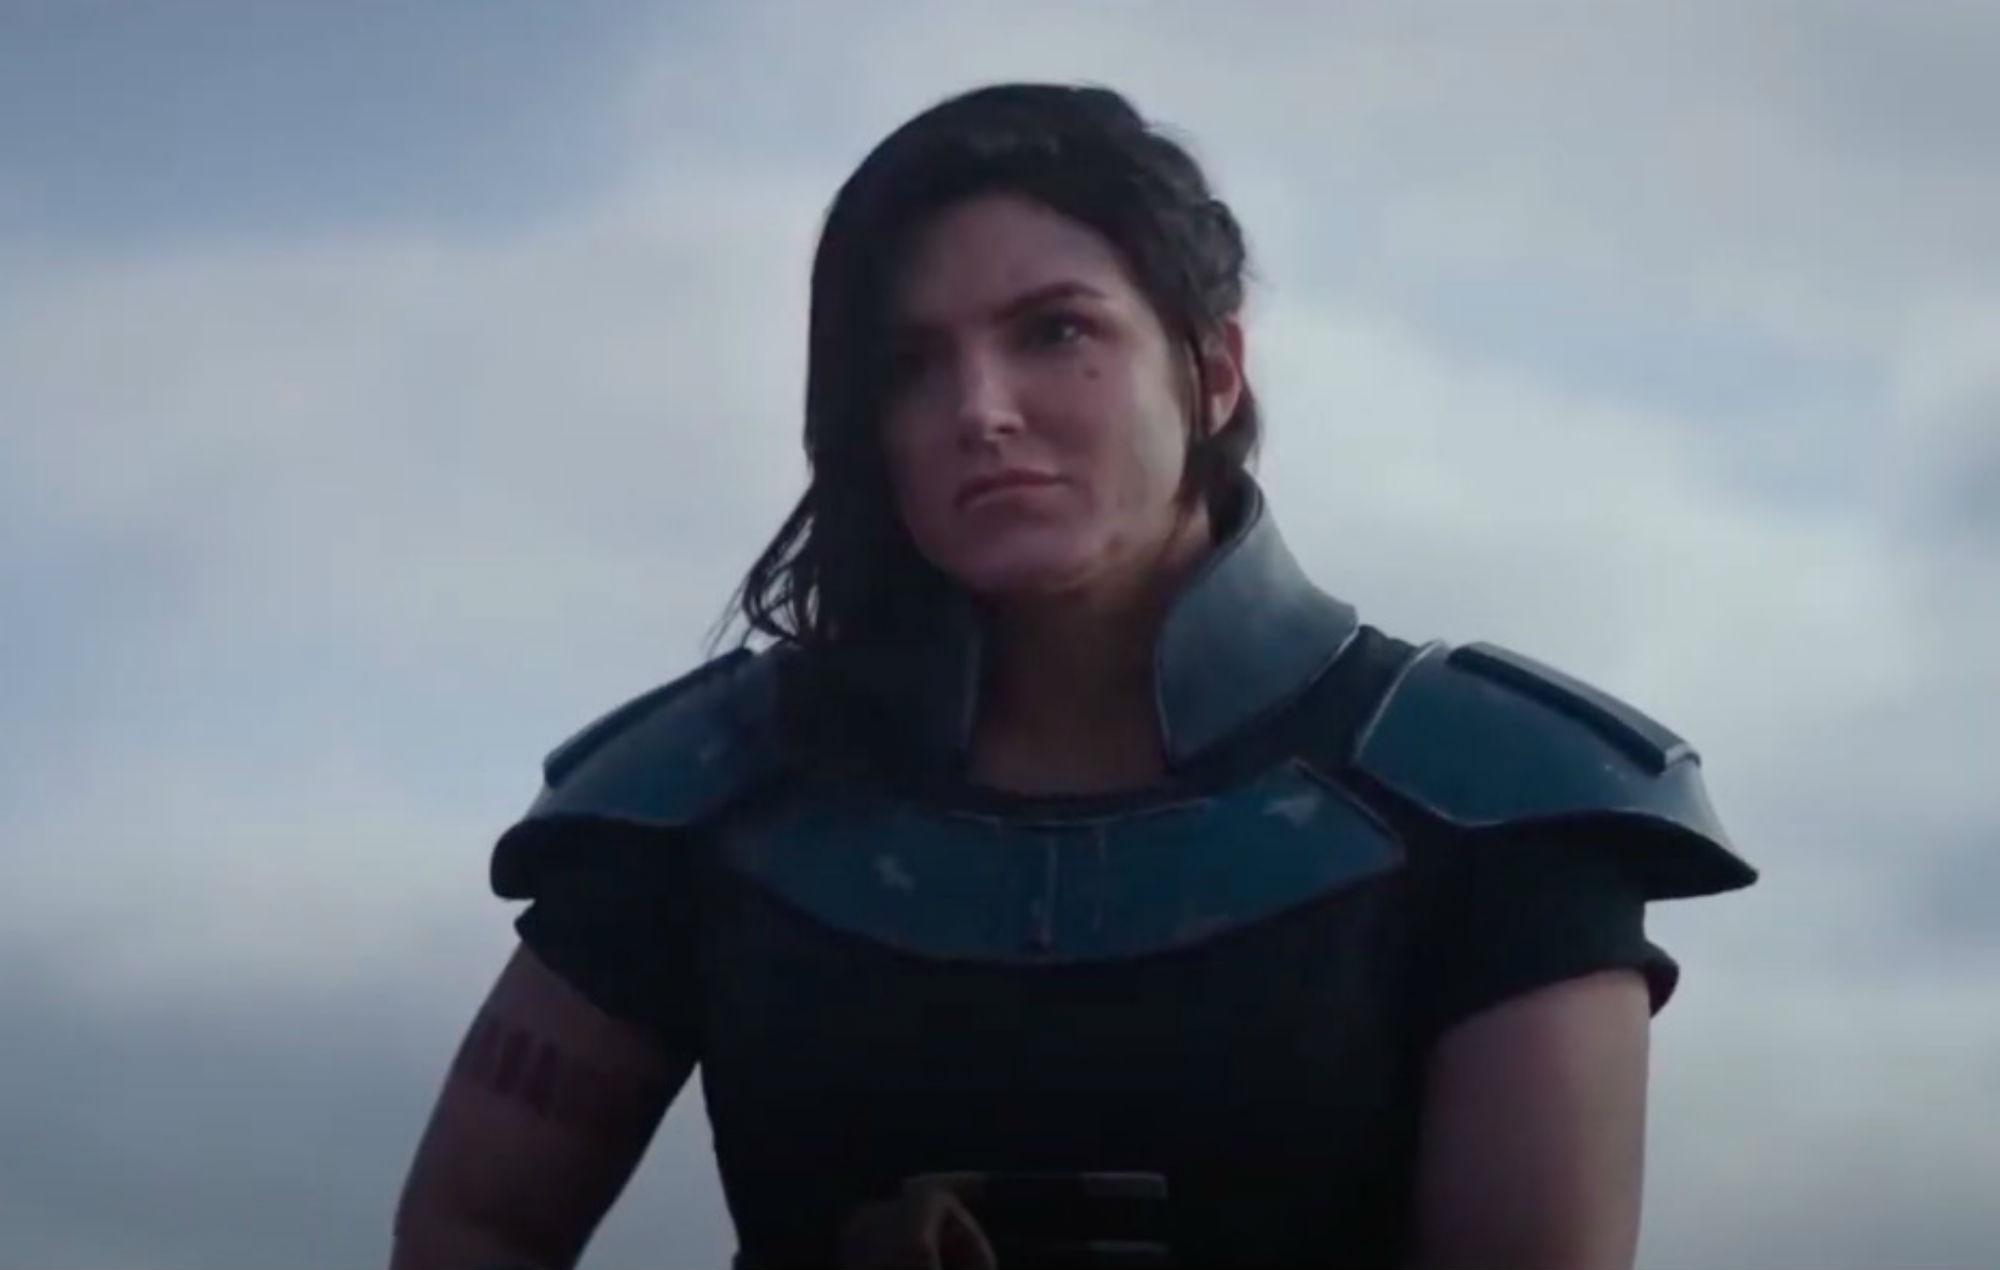 Disney boss responds to the sacking of 'The Mandalorian' actor Gina Carano